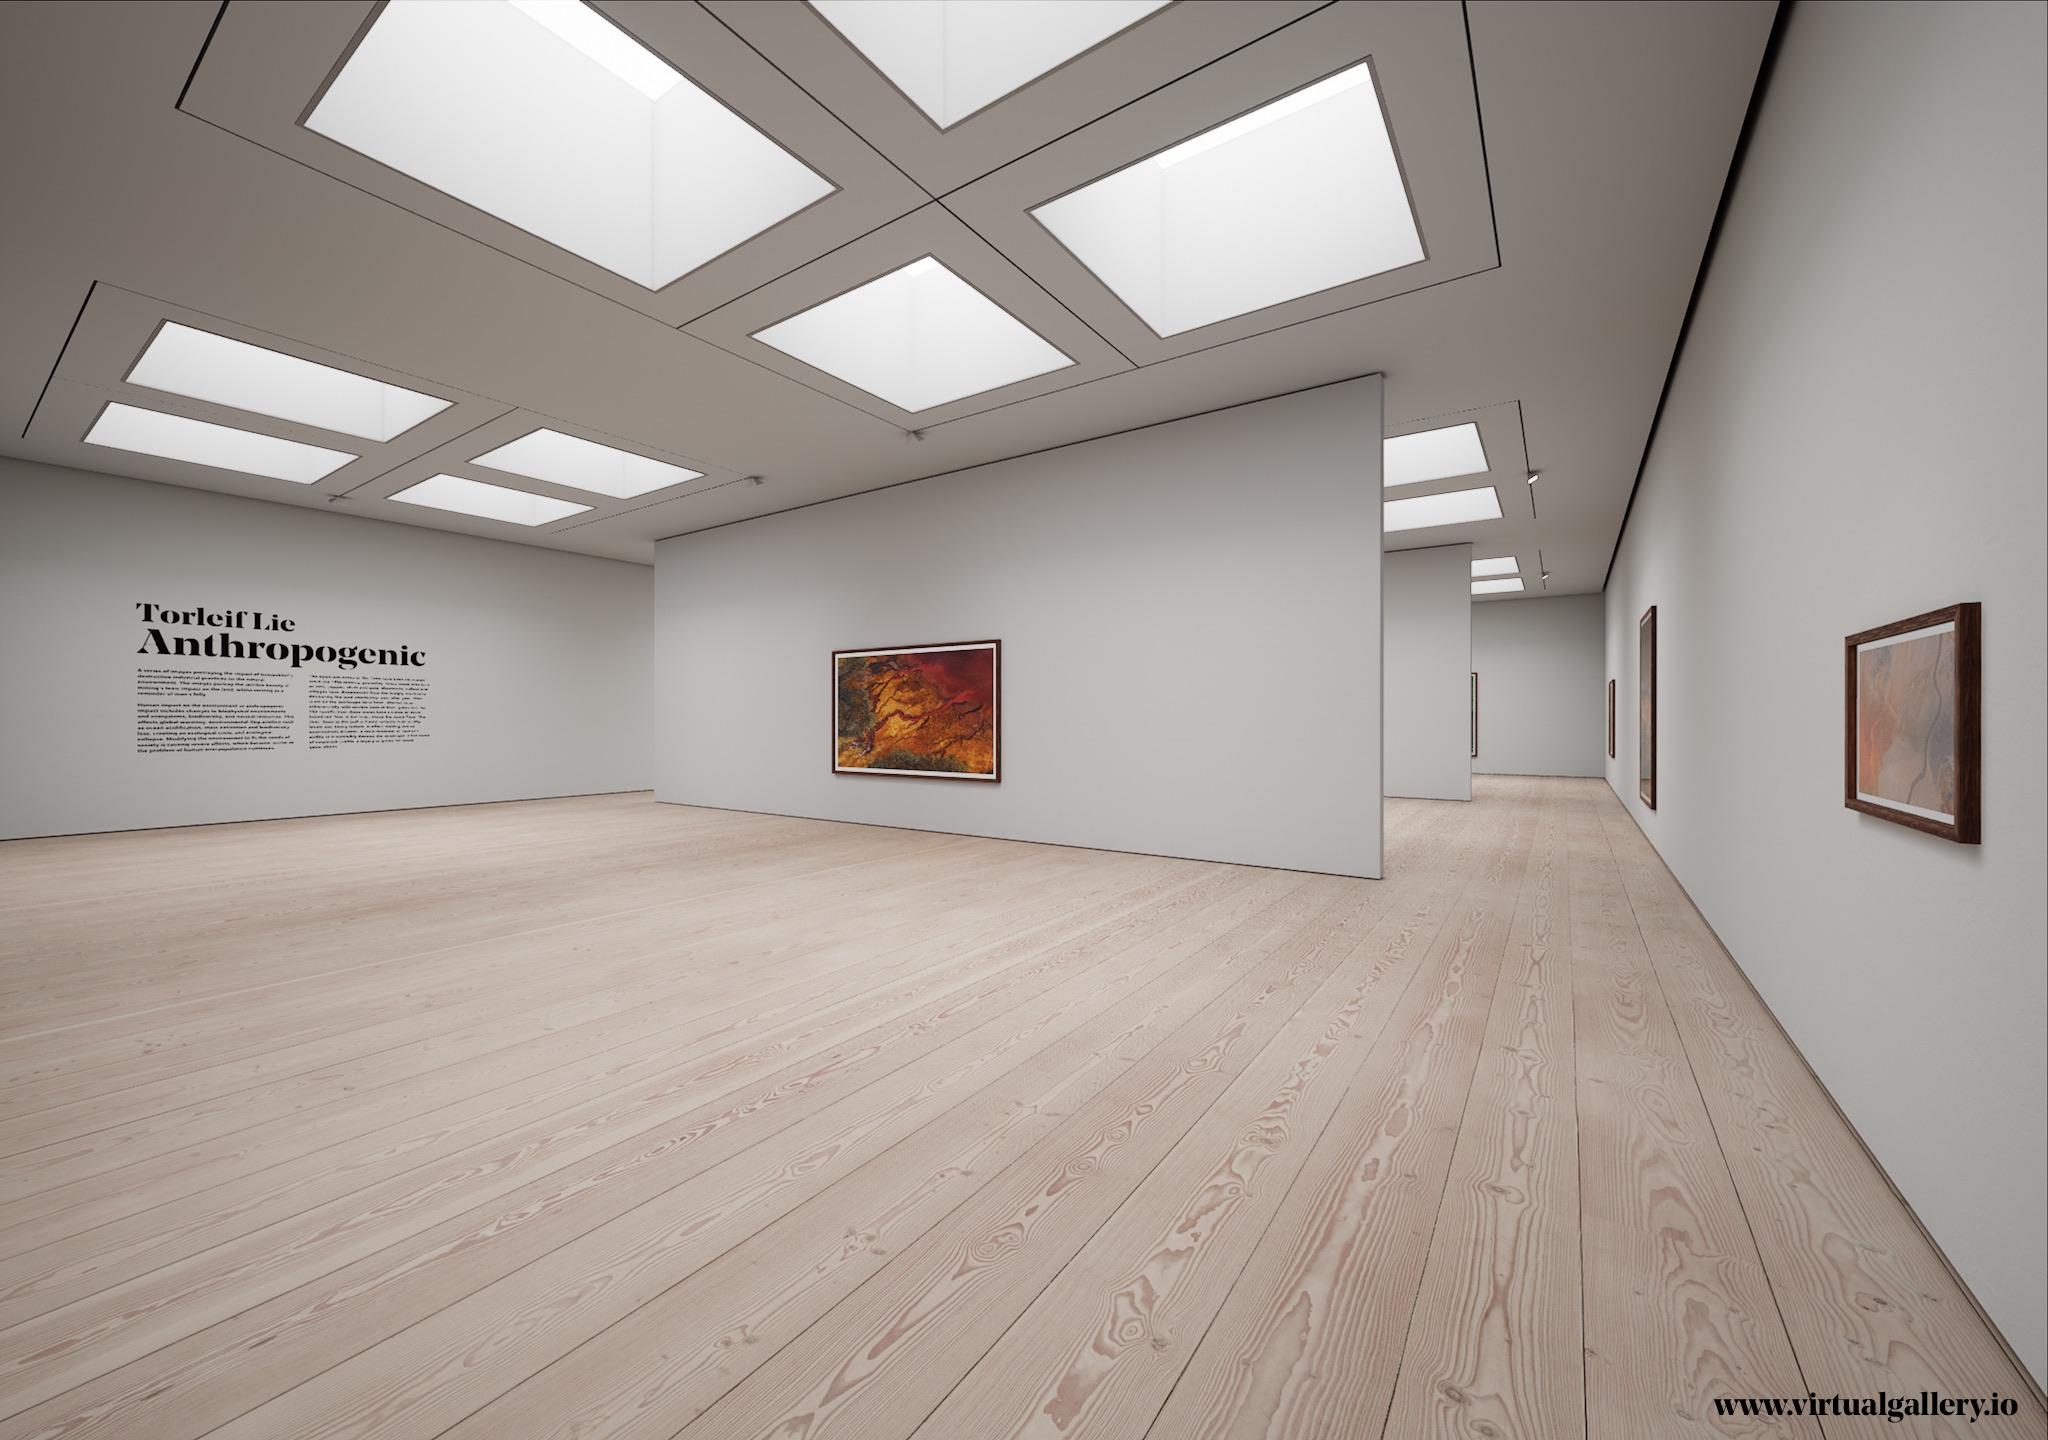 Virtual Gallery Reimagined